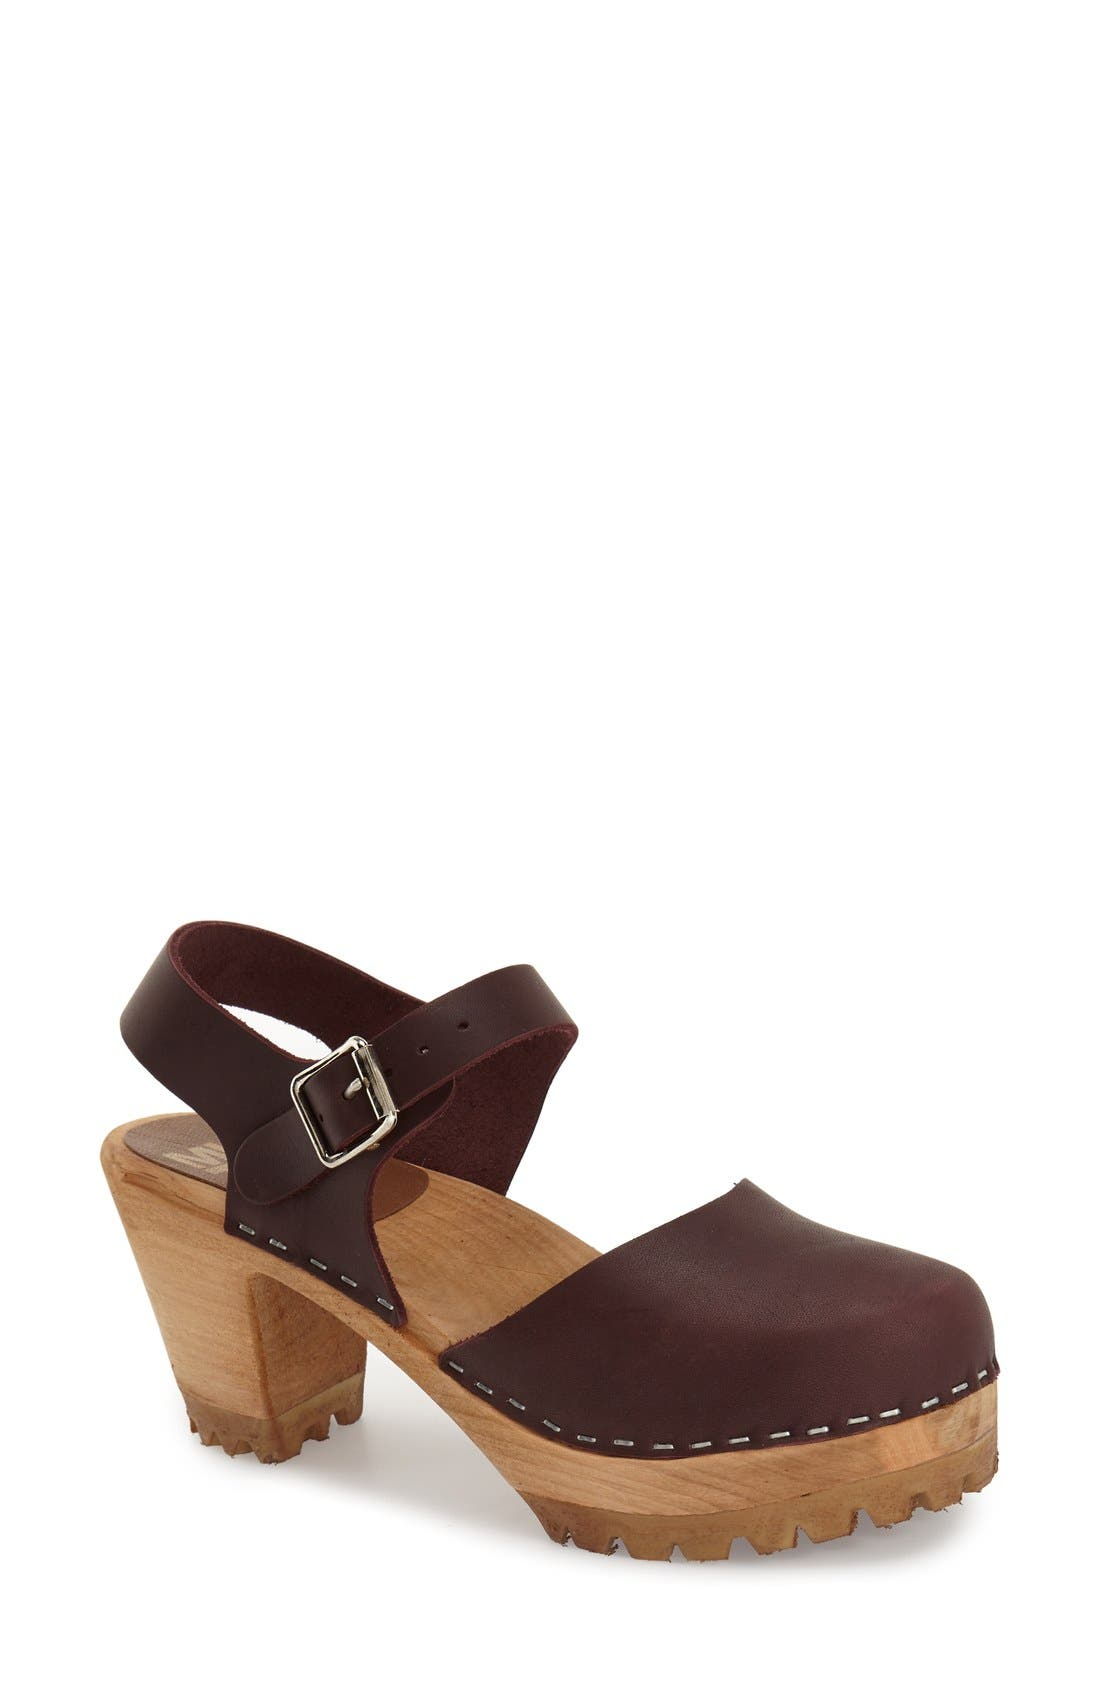 19ffc1c9da8 ... UPC 887696549743 product image for Women s MIA  Abba  Sandal